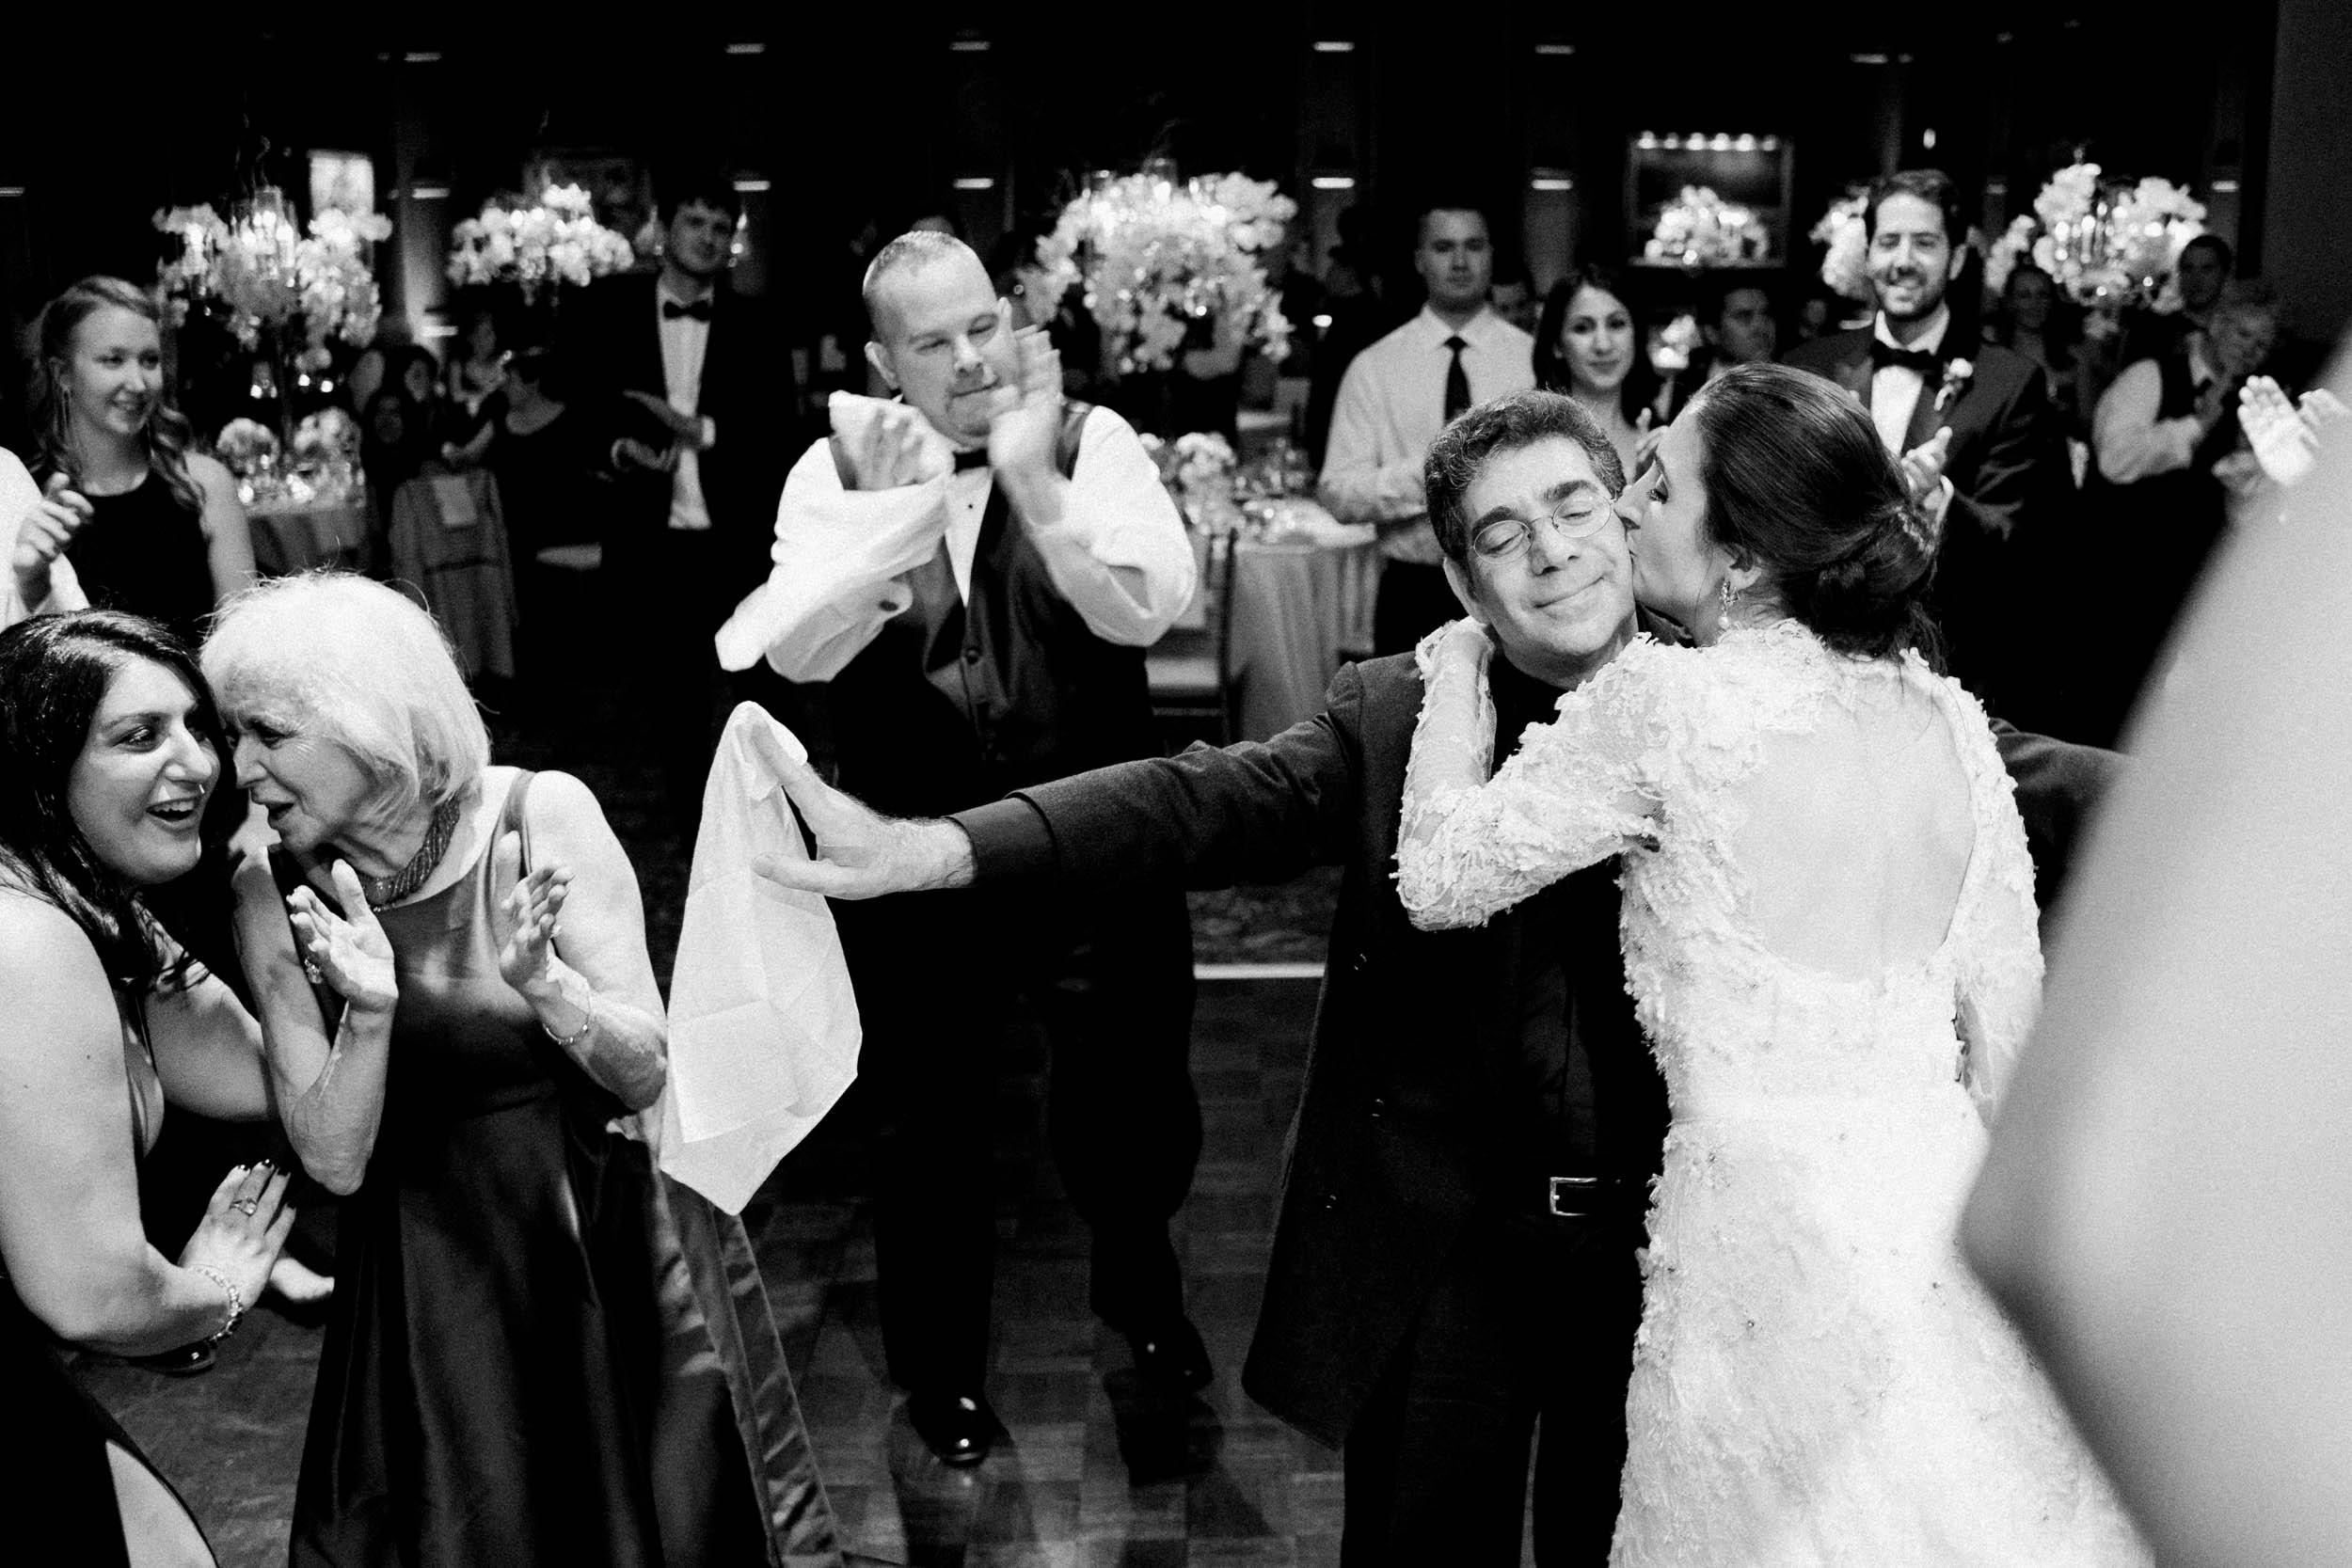 Wedding Reception Dancing at Bohemian Club in San Francisco